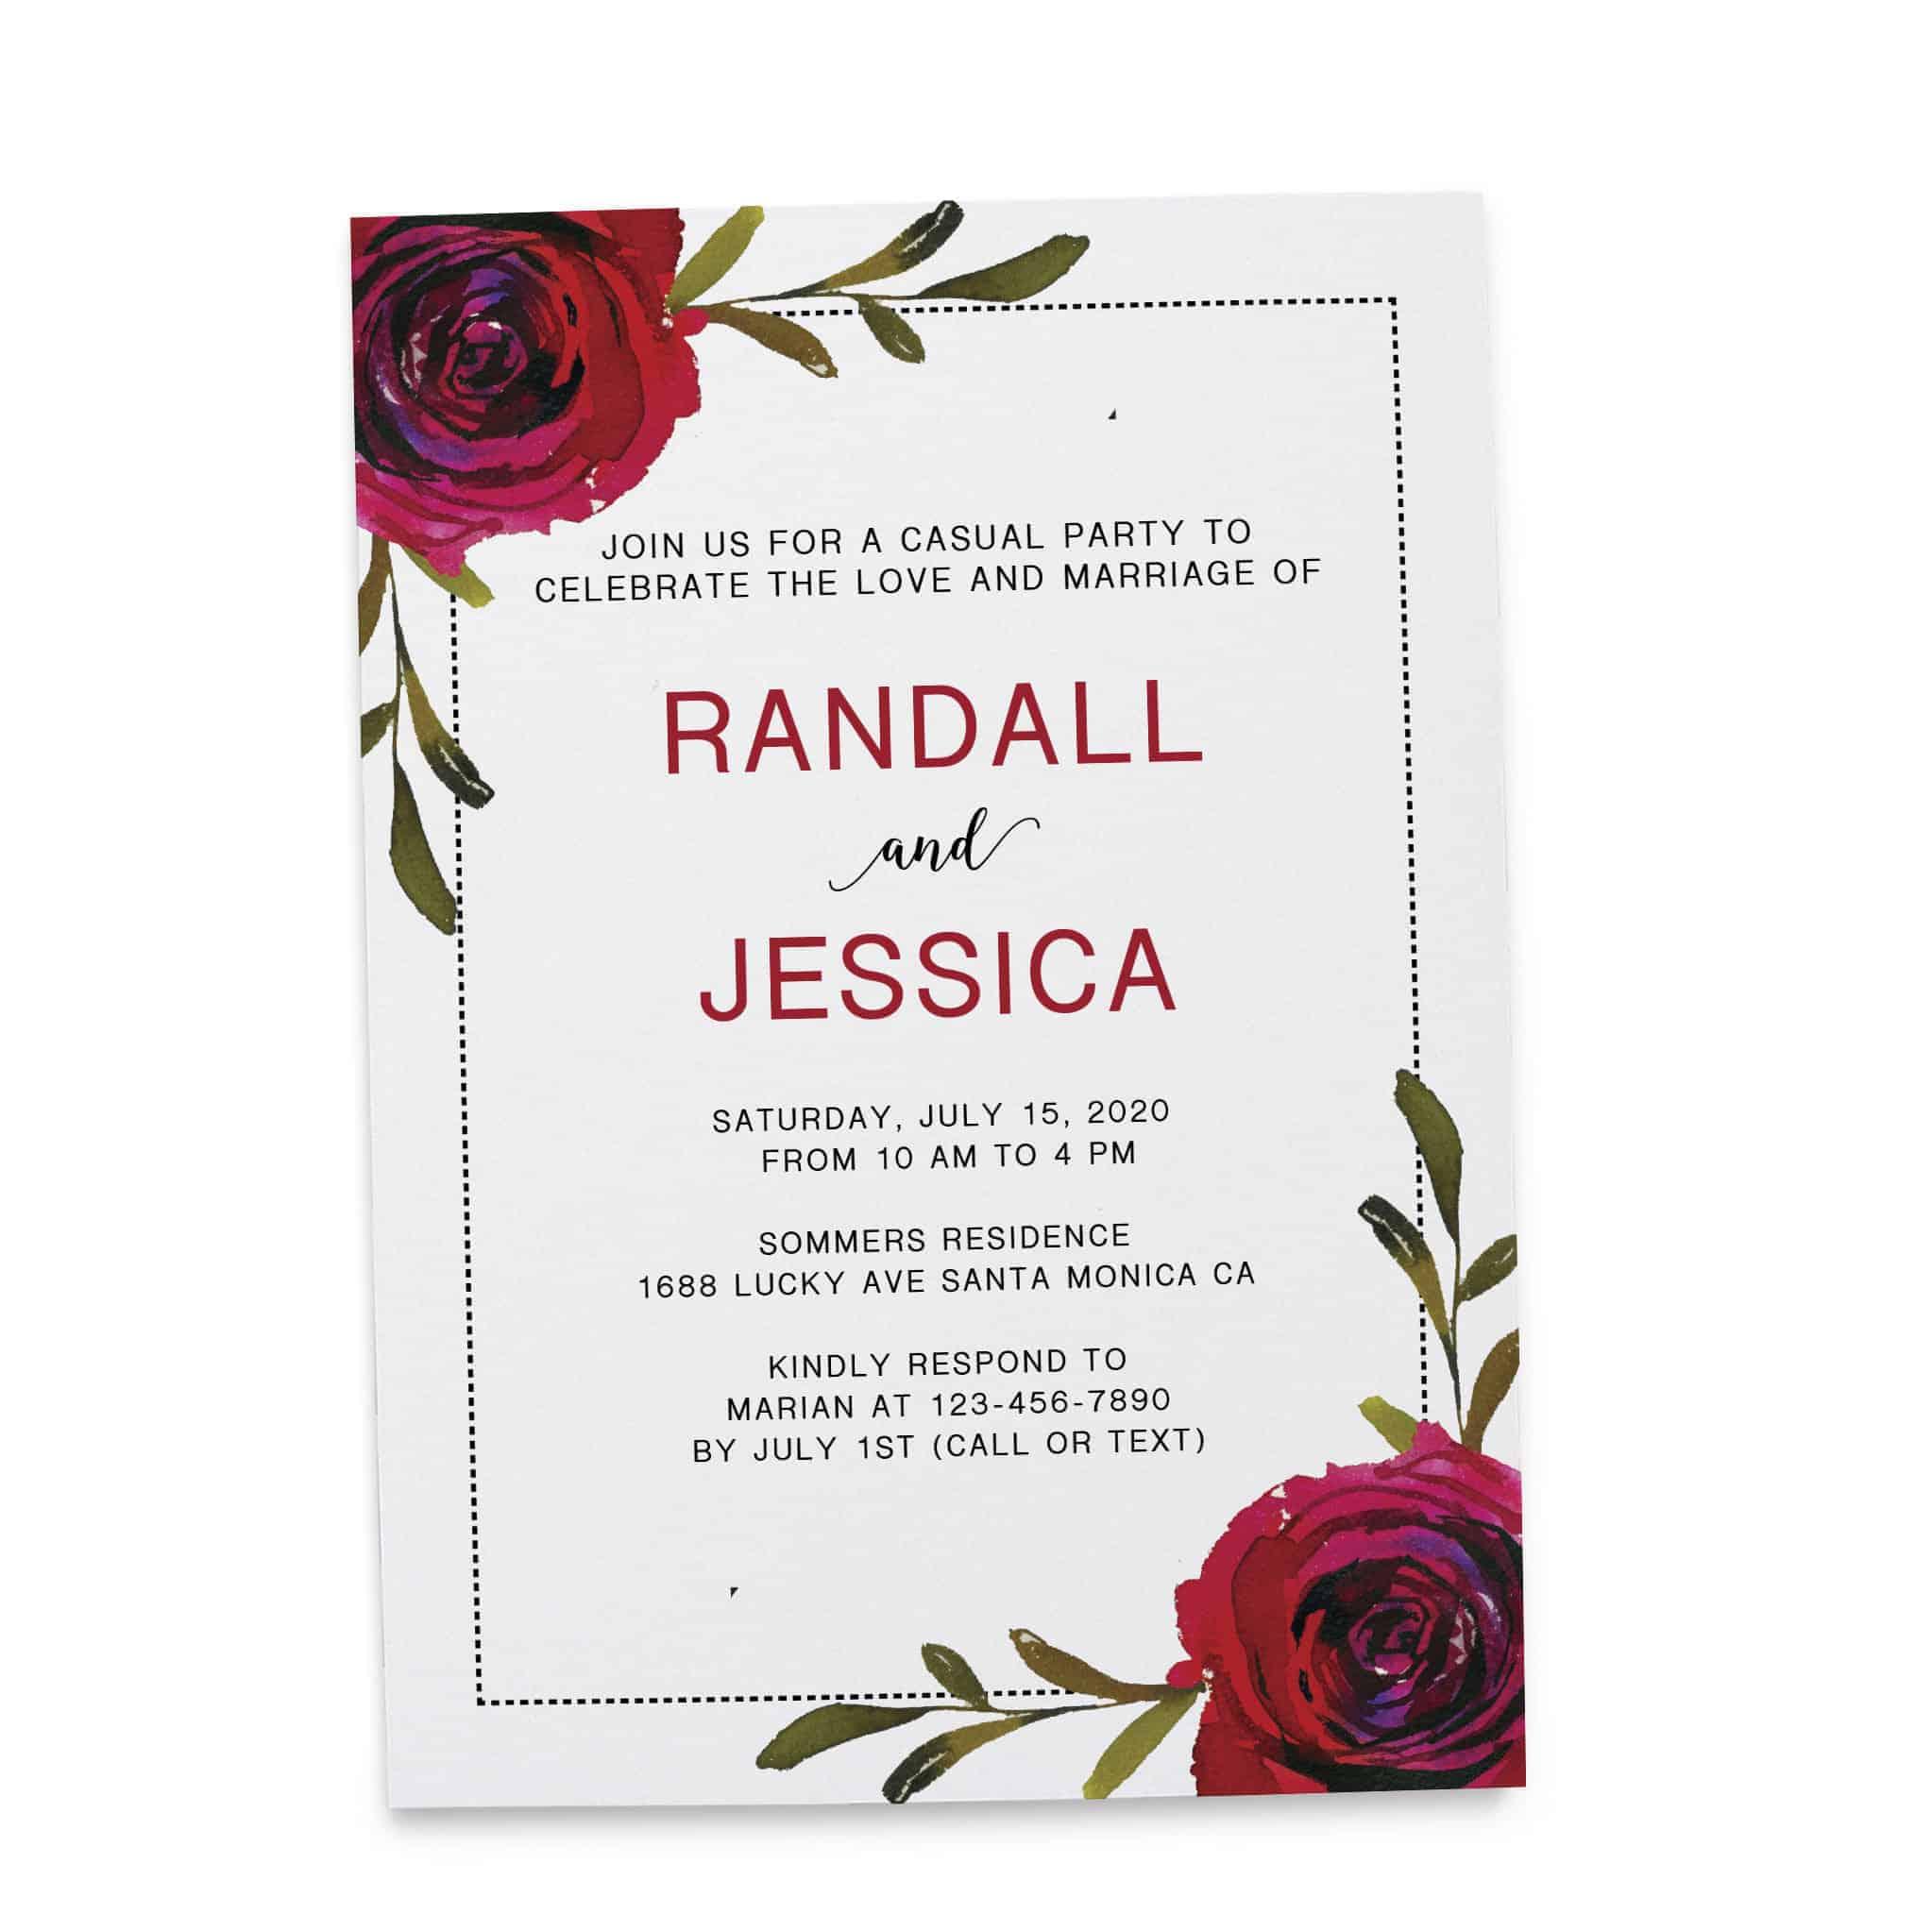 Post Elopement Party Invitation Cards, Custom Wedding Celebration Cards, Wedding Favors, Dazzling Roses Theme elopement308